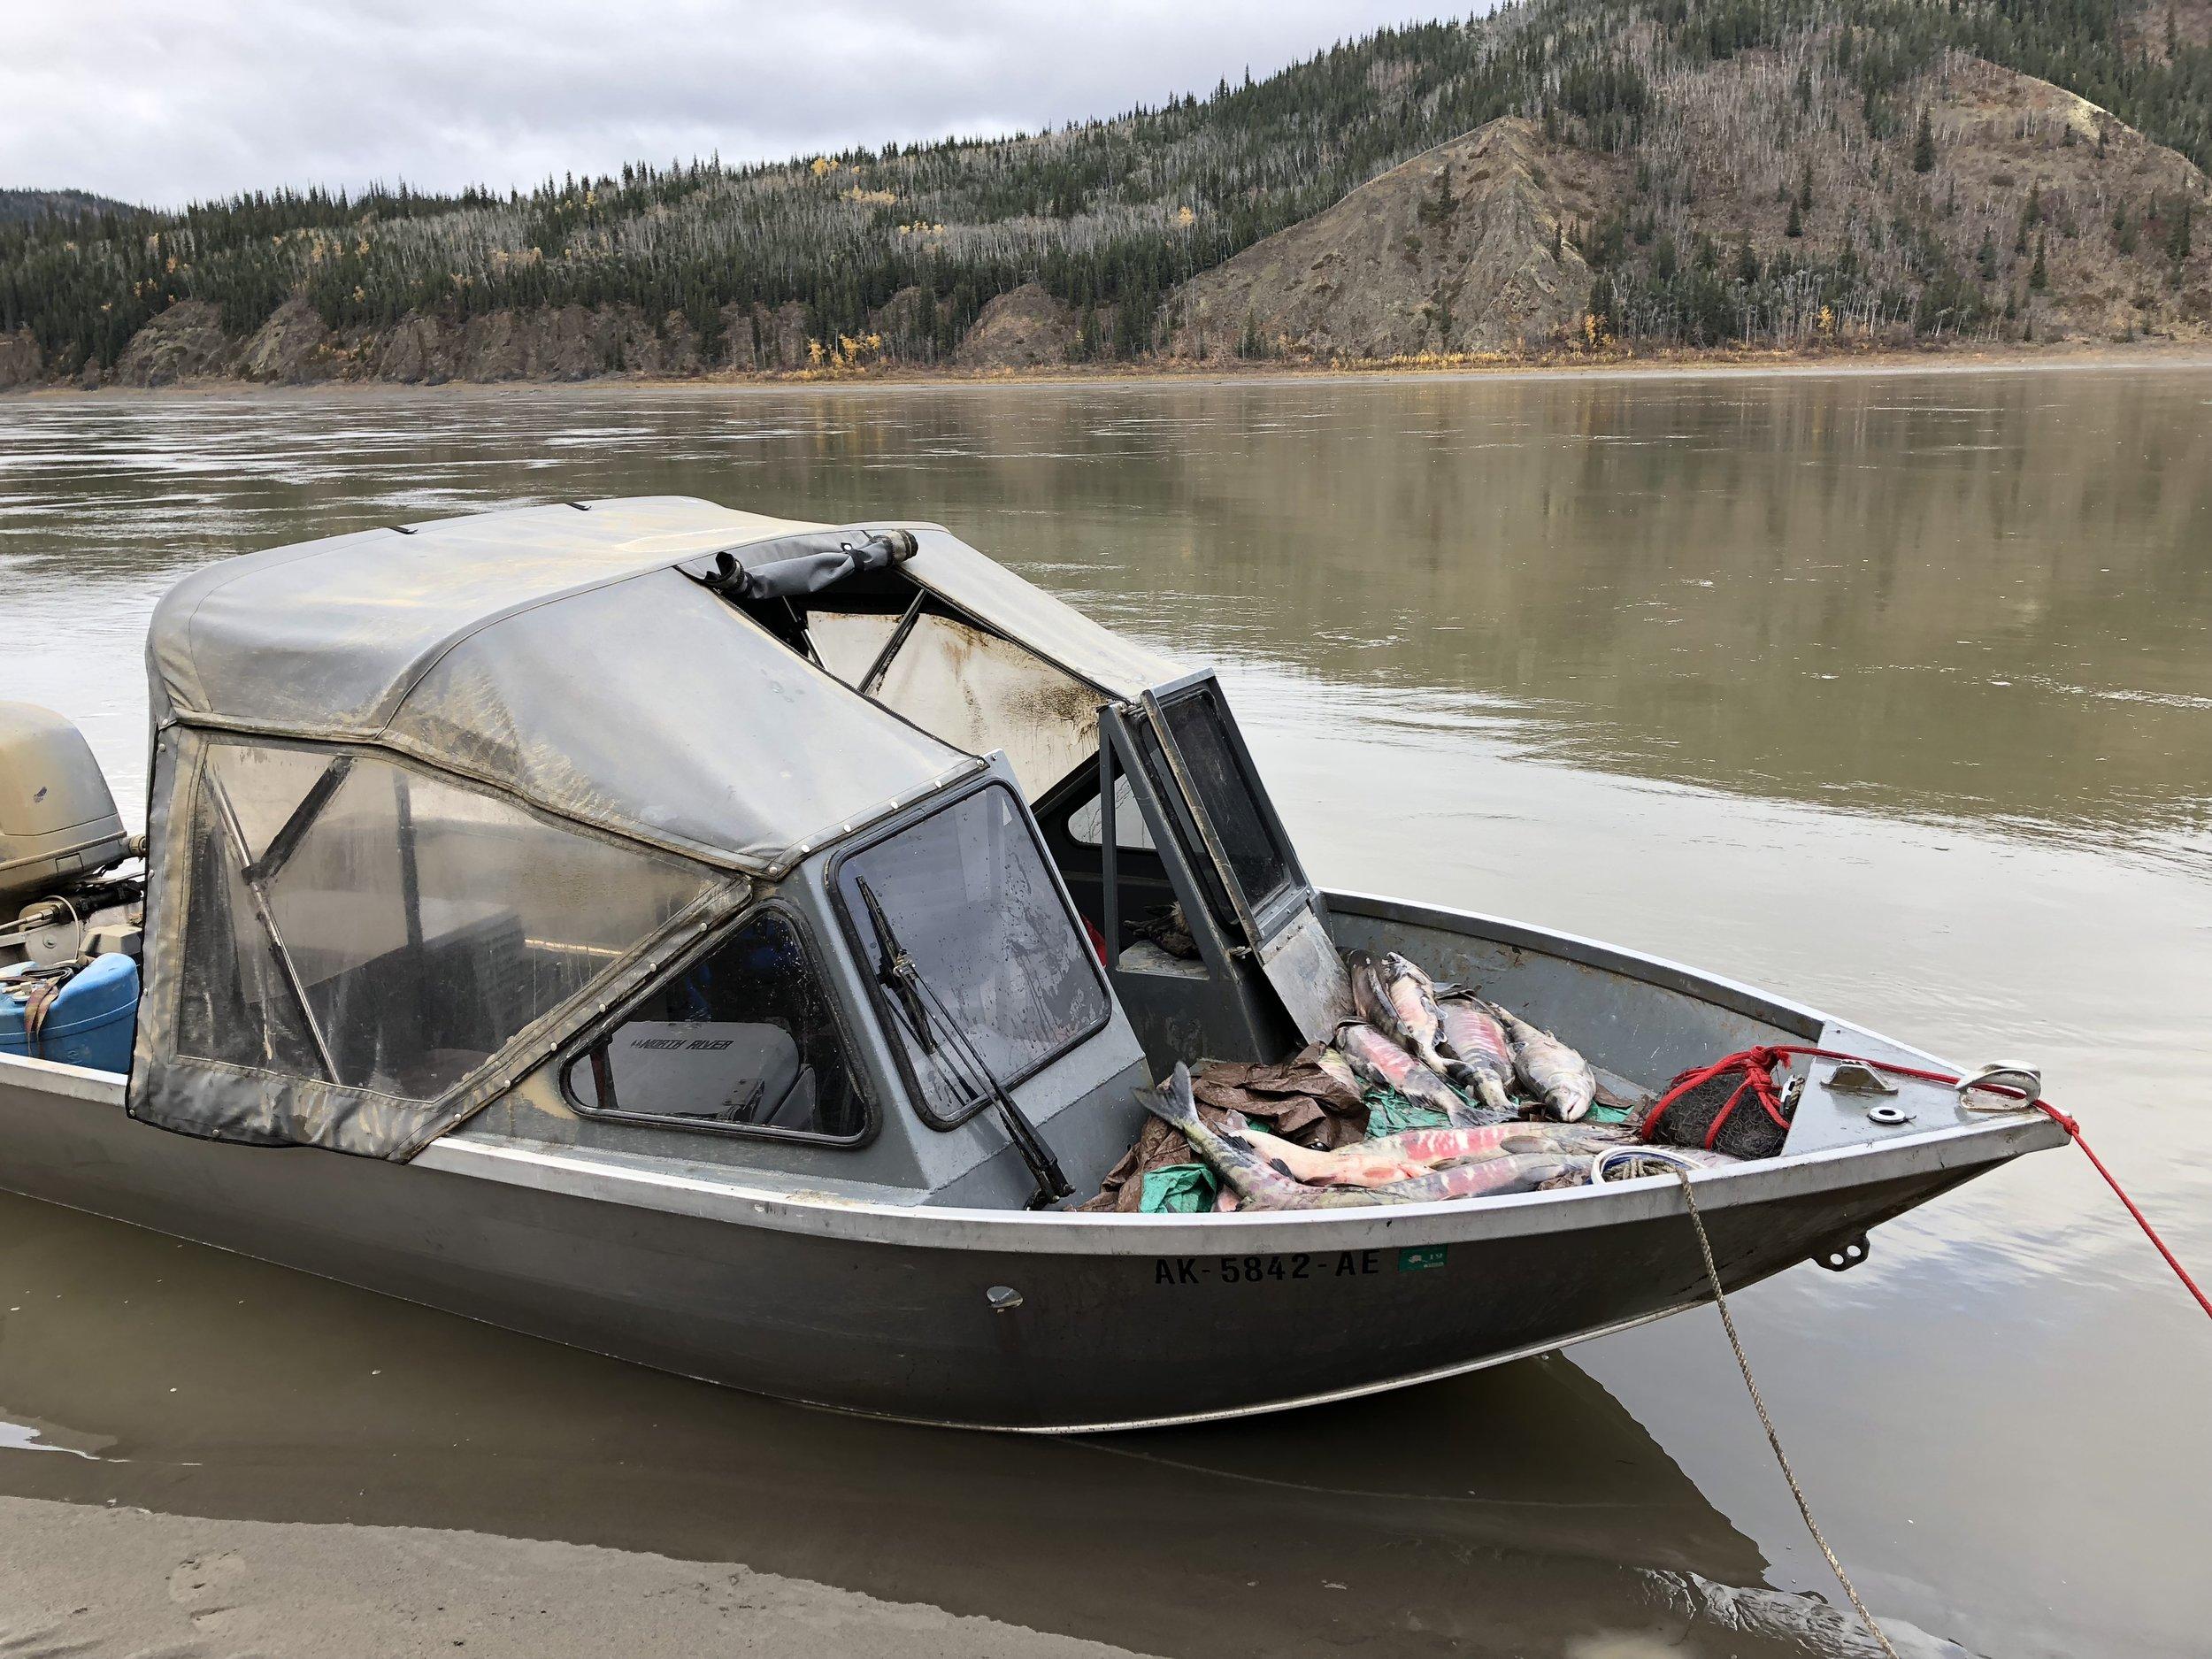 Scott_s Boat with fish.jpg